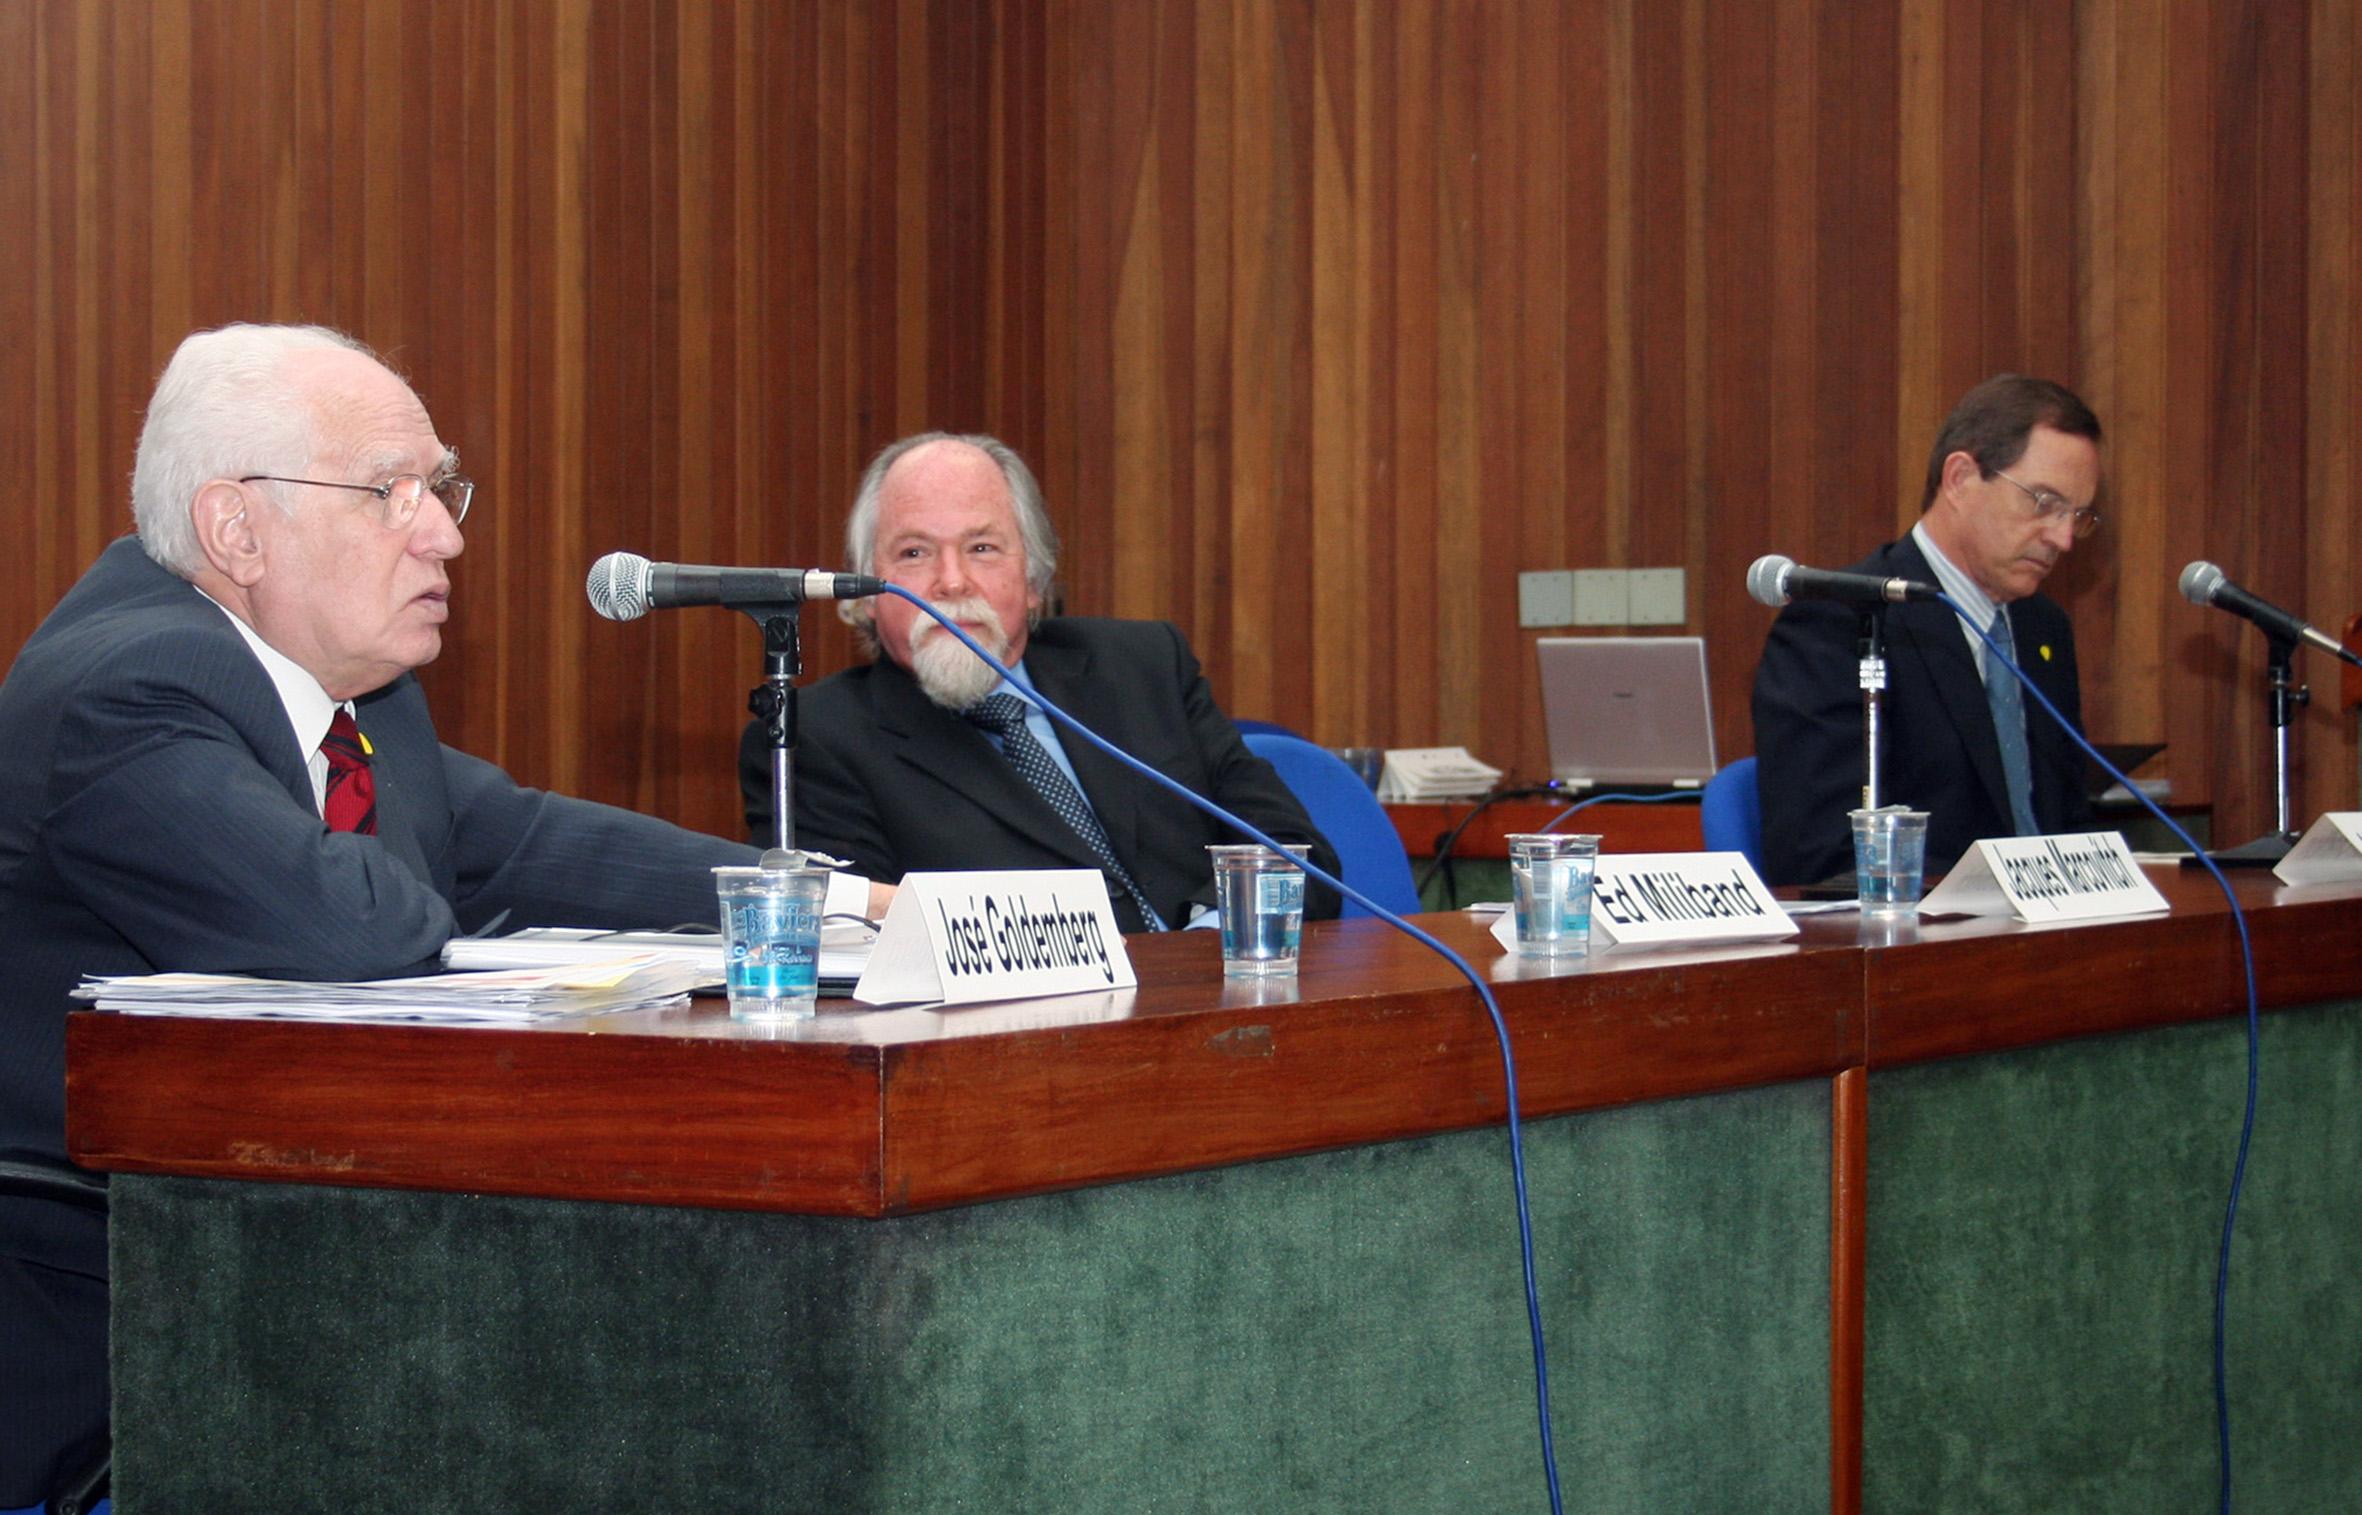 José Goldemberg, Jacques Marcovitch e Luiz Fernando Furlan